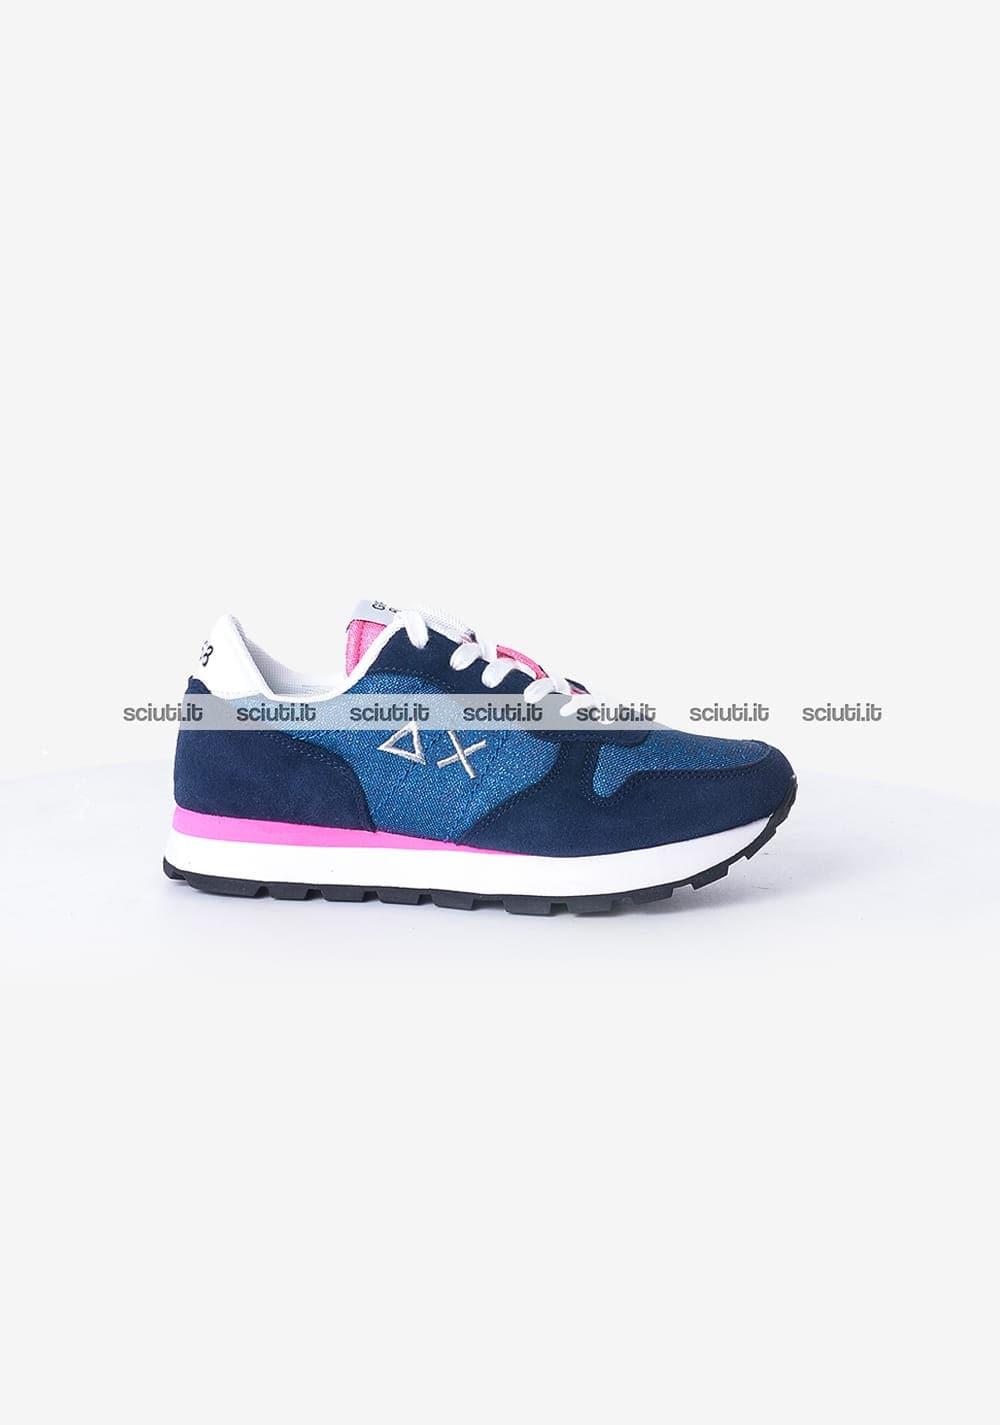 online store 052d4 74f49 Scarpe Sun68 donna Ally glitter mesh blu | Sciuti.it